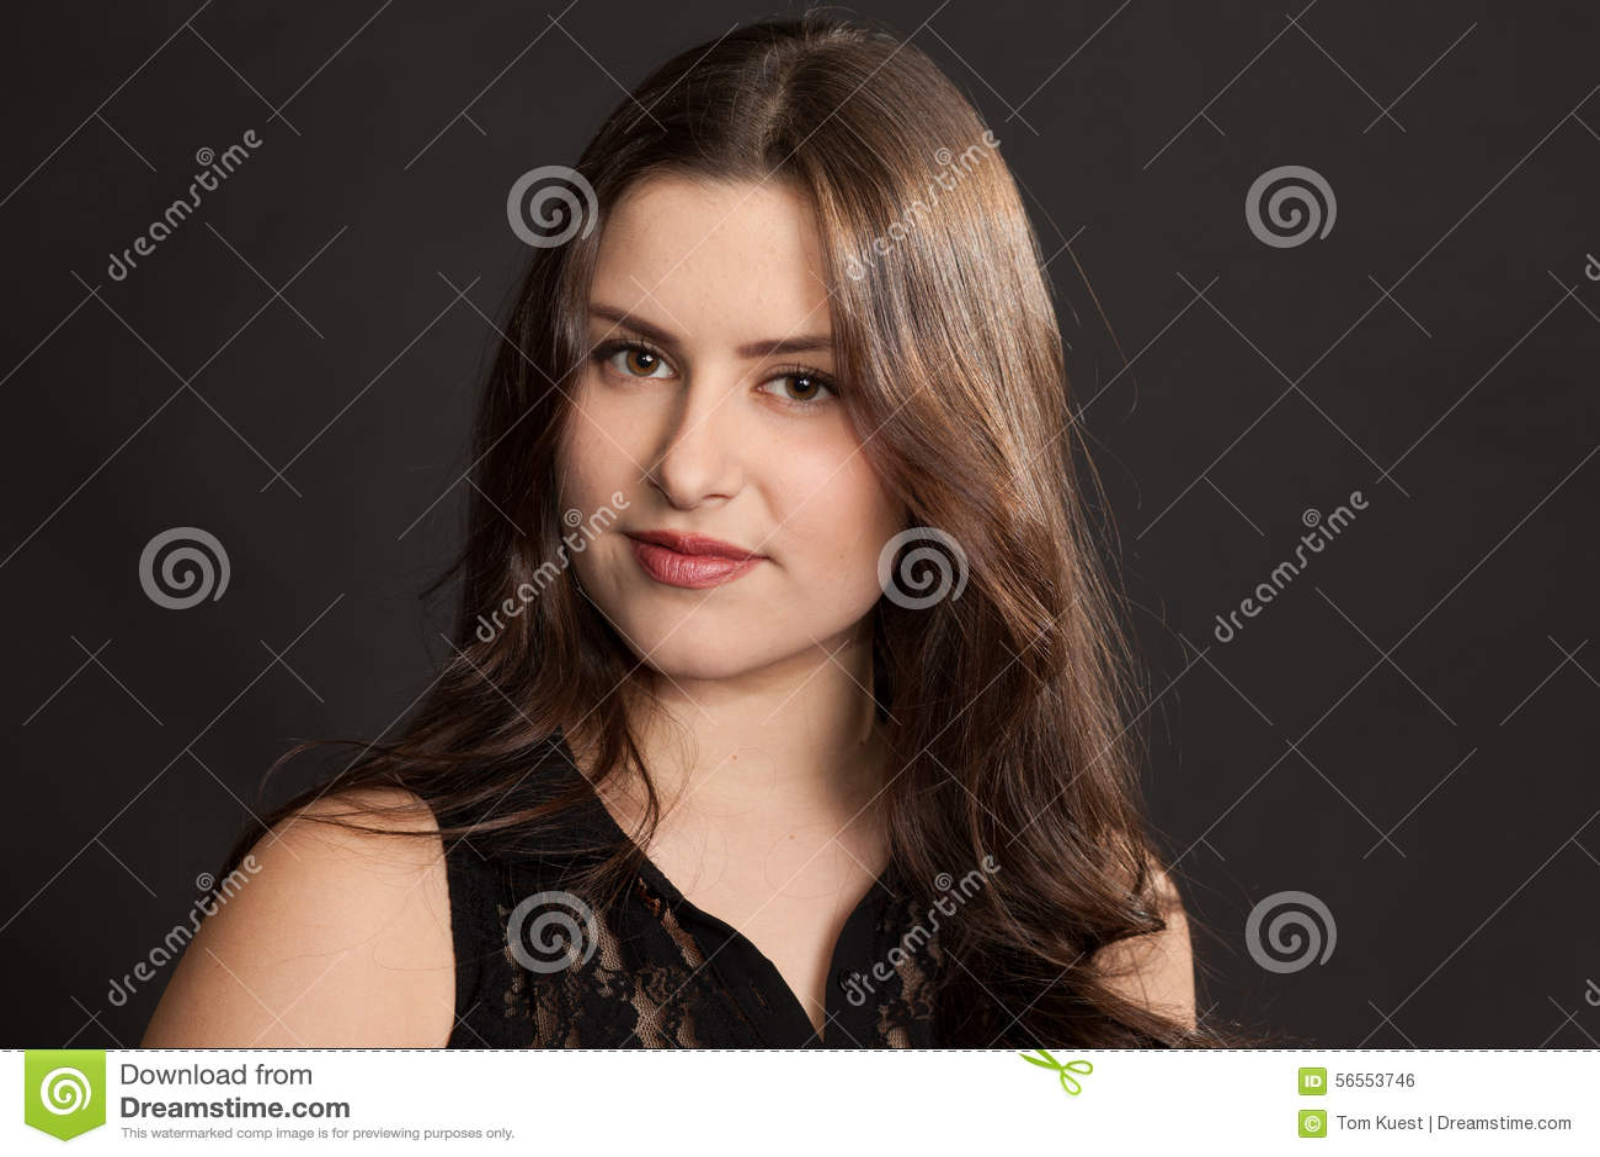 Download Όμορφο πορτρέτο γυναικών σε ένα στούντιο Στοκ Εικόνες - εικόνα από τρίχωμα, περιστασιακός: 56553746